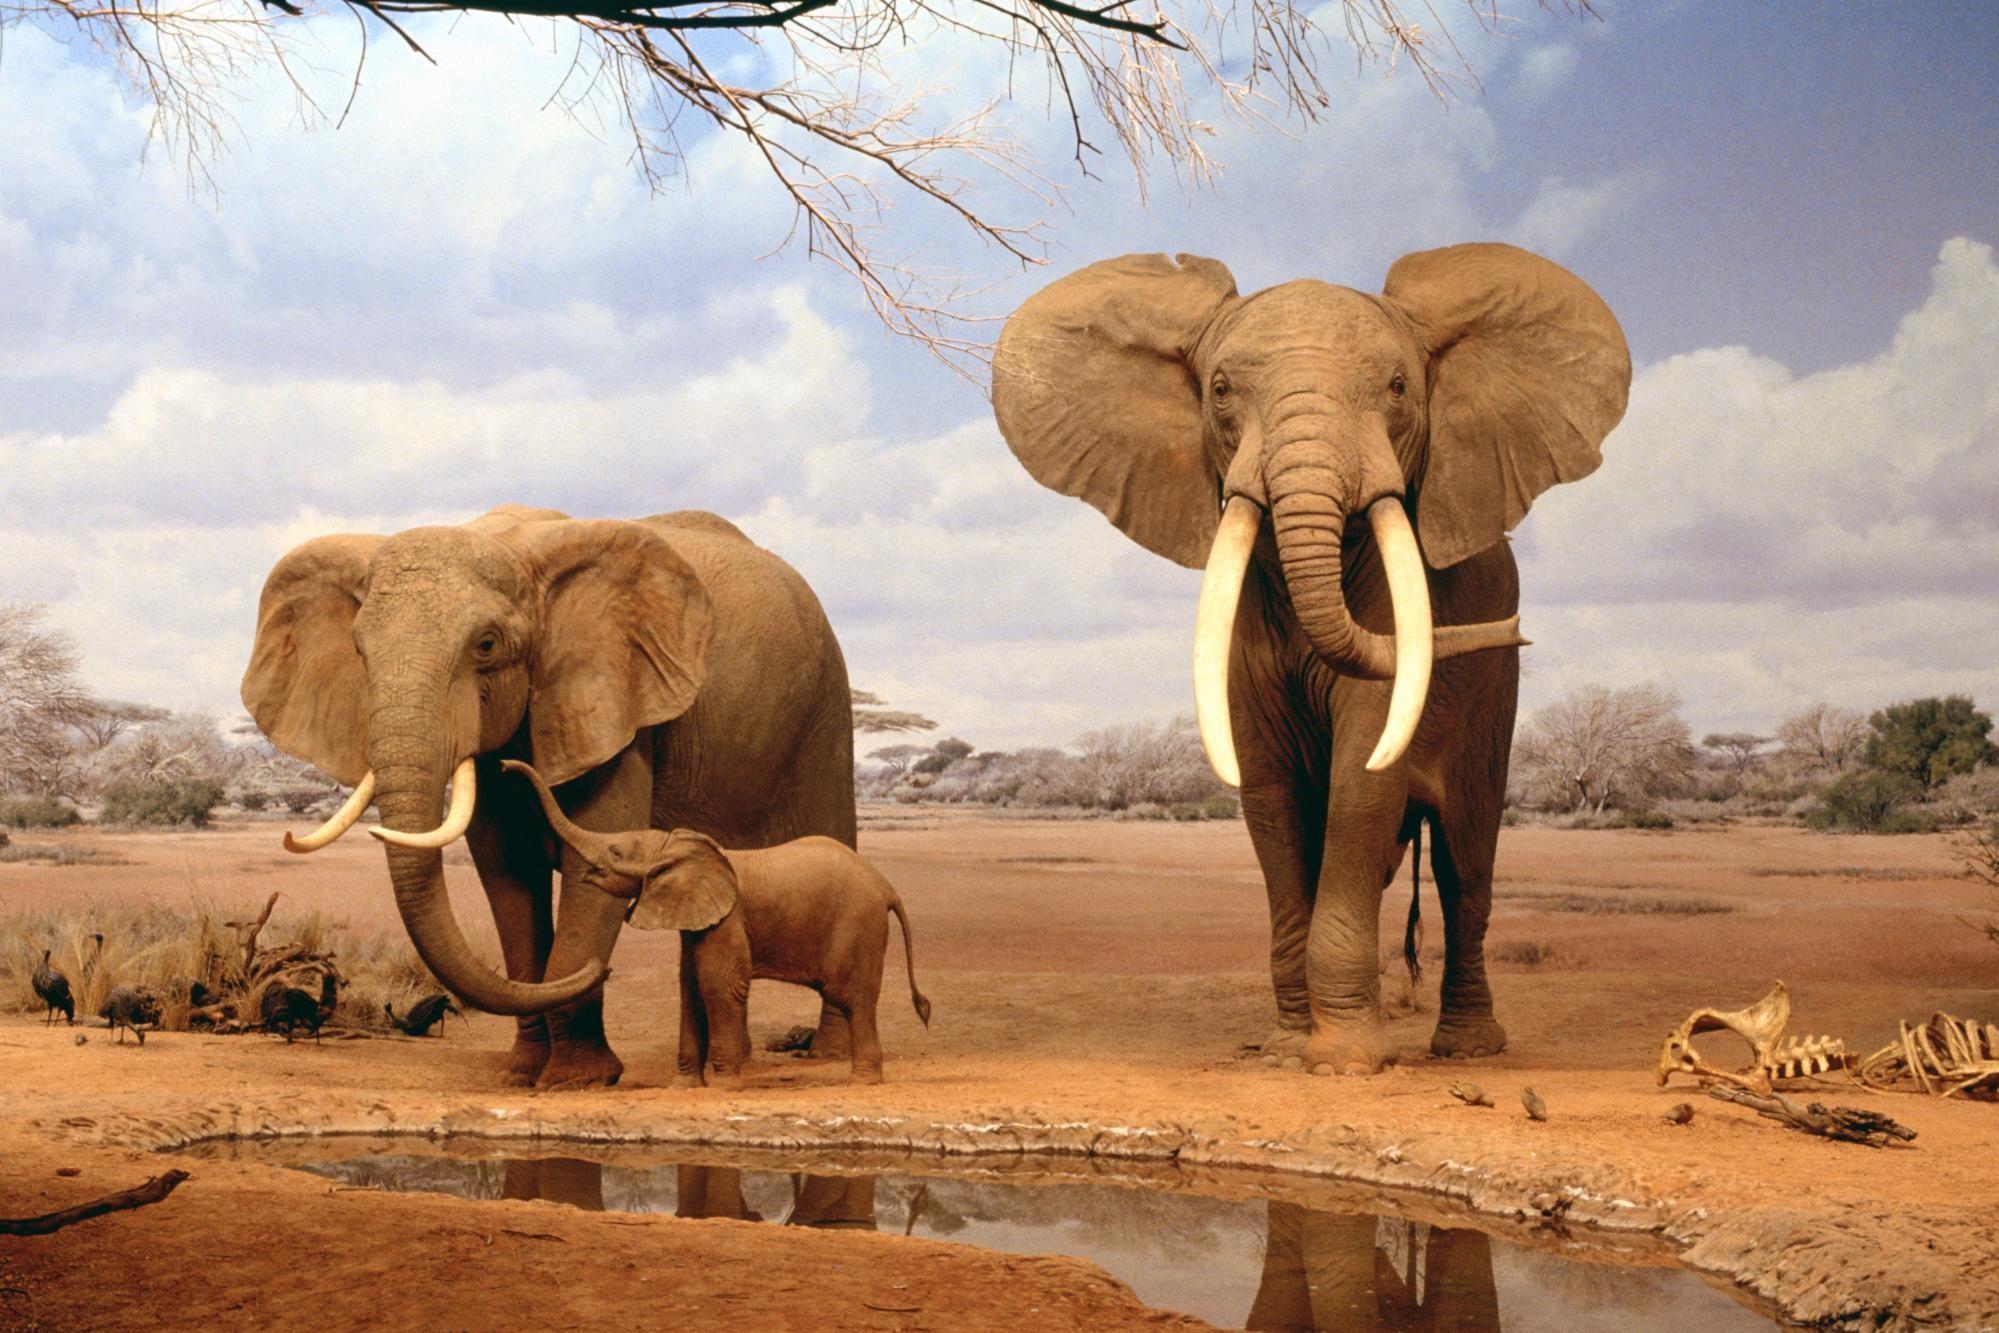 Africa Elephants Summer Animals Desktop Wallpaper | Full HD Wallpapers .